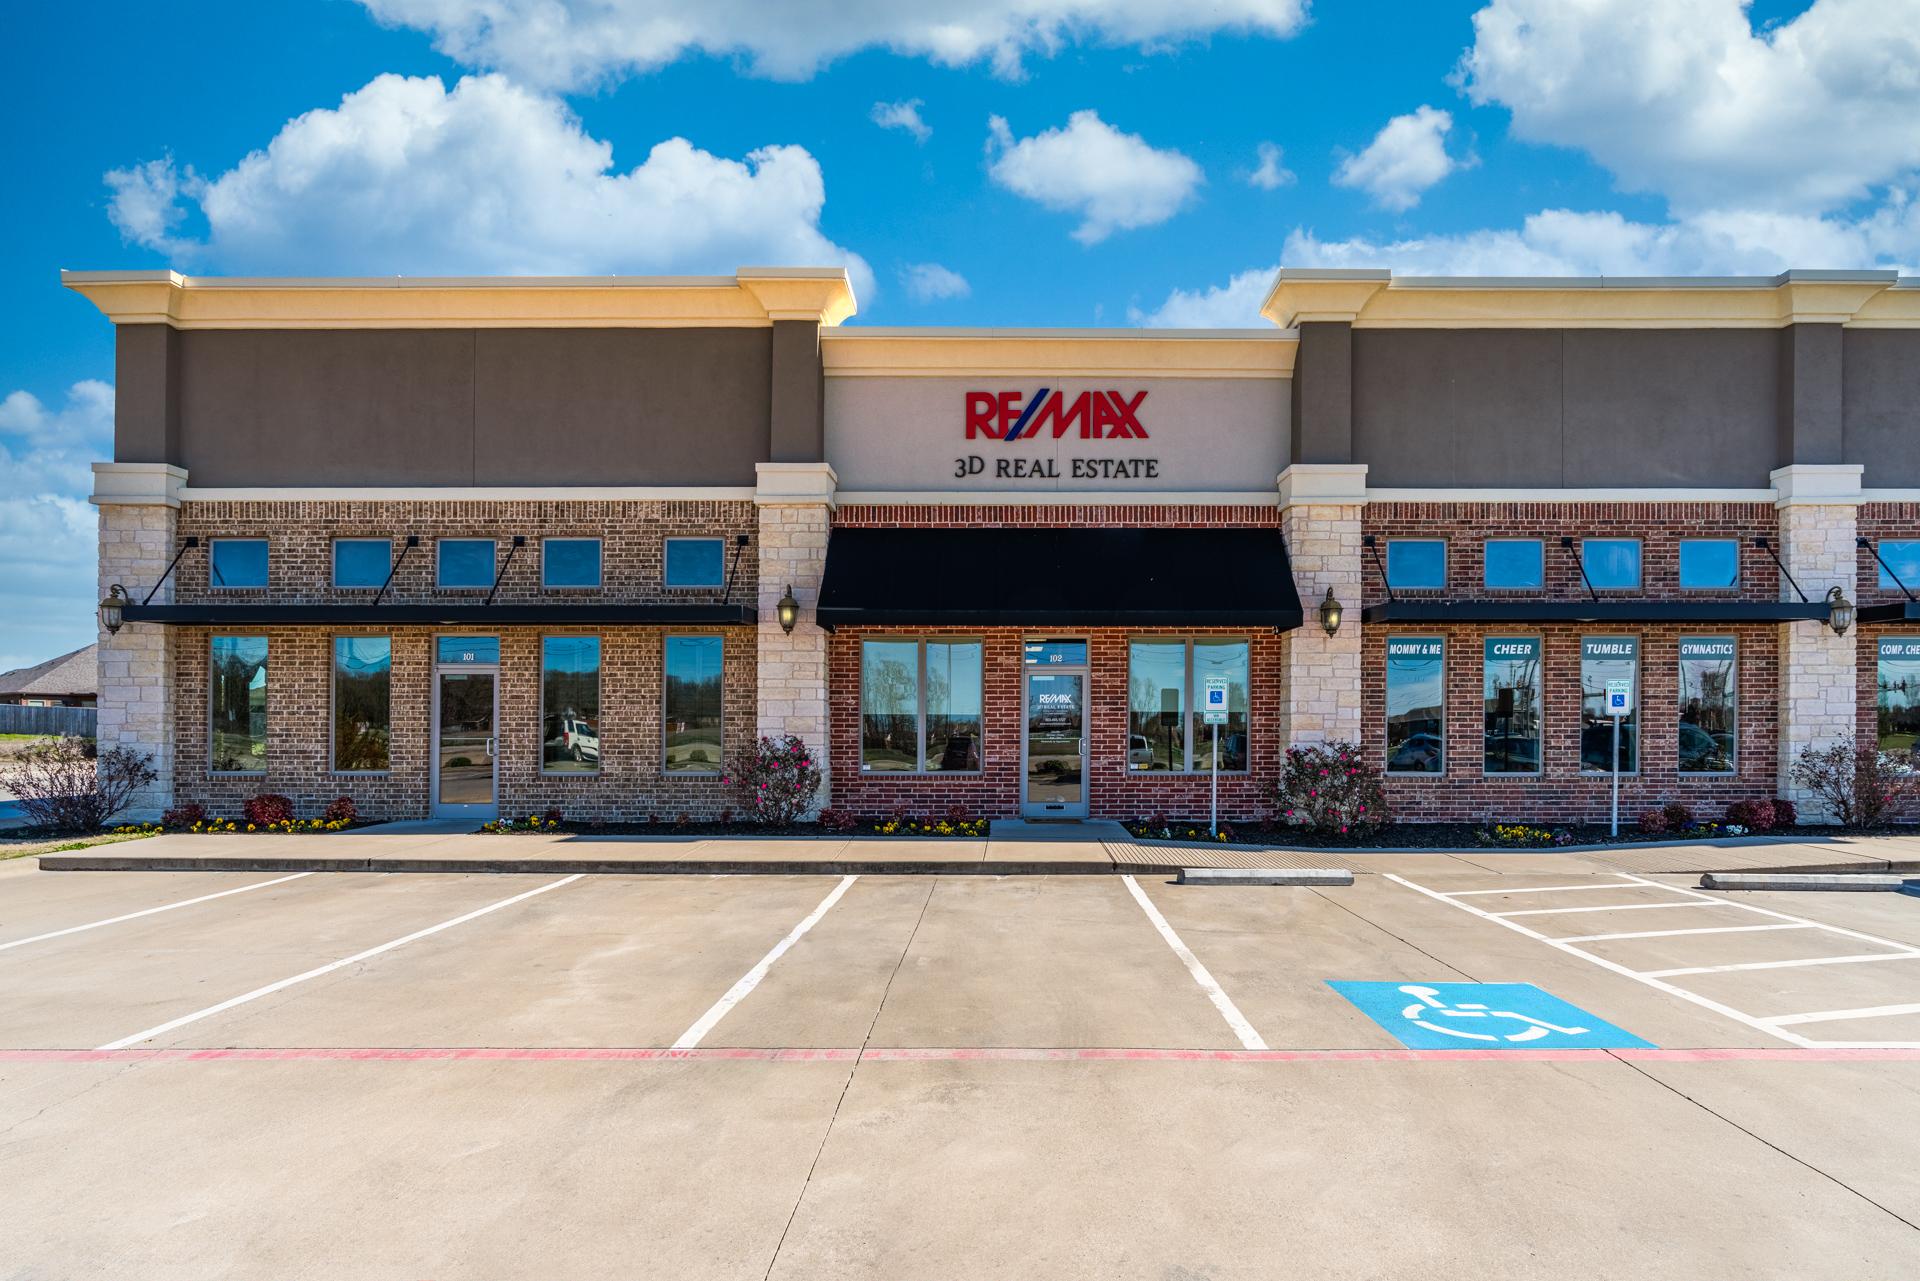 RE/MAX 3D Real Estate